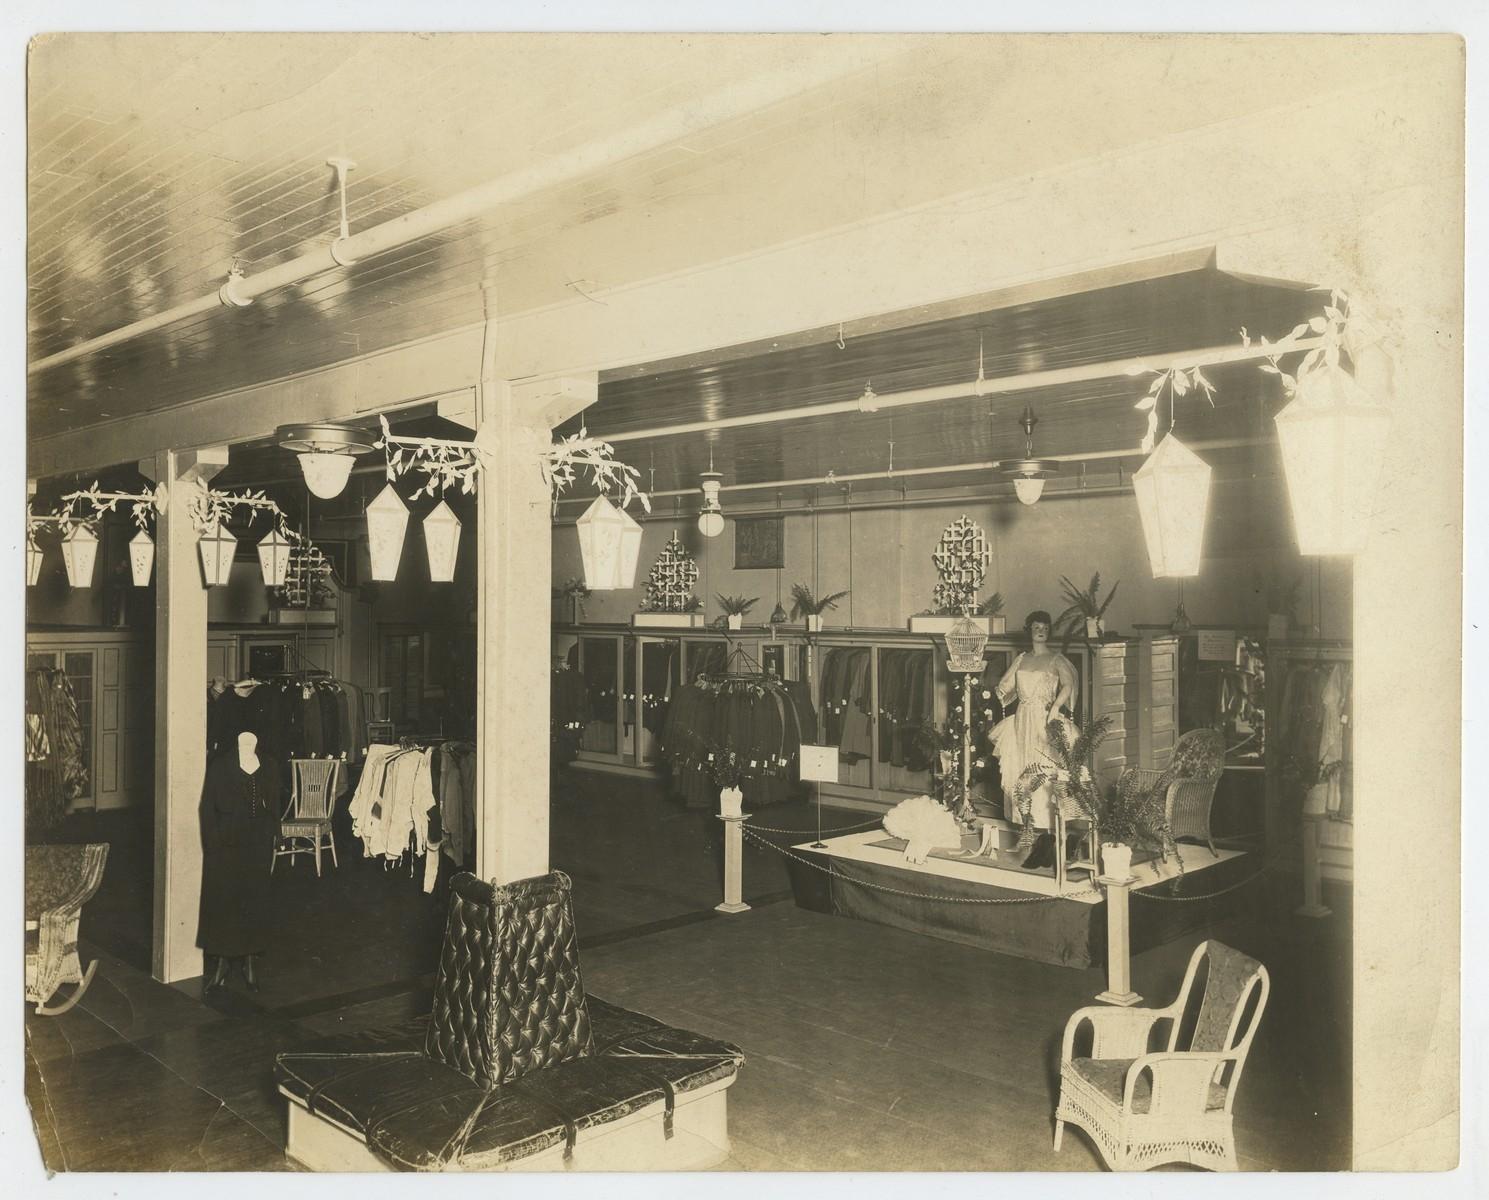 Rudy's Department Store, Interior